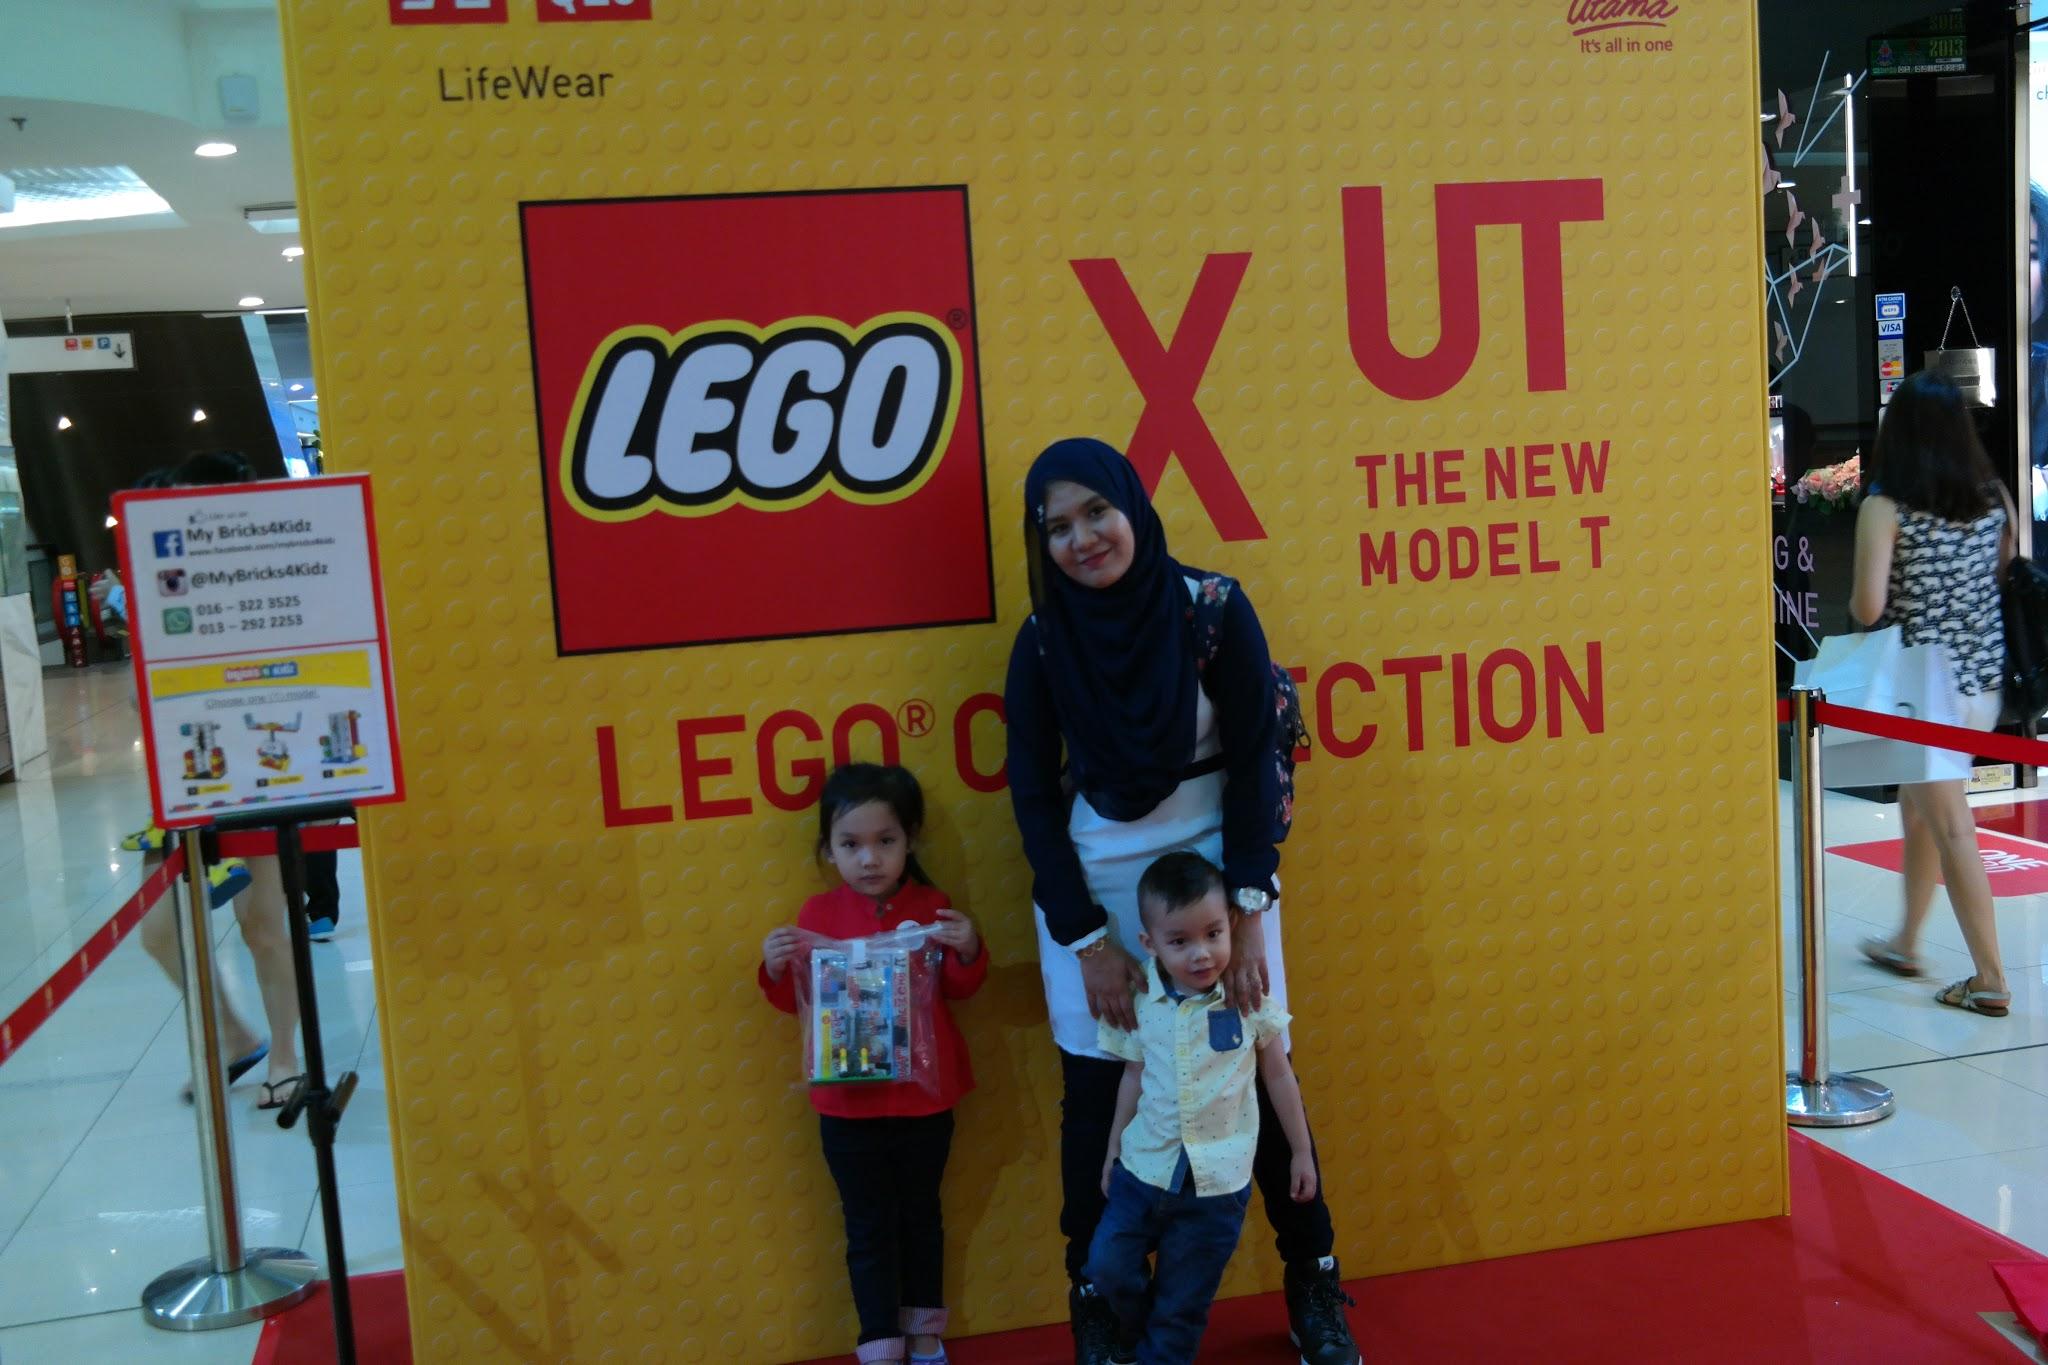 Uniqlo X UT, New T Lego Collection Events, uniqlo, uniqlo malaysia, nuffnang, nuffnang events, lego with kids, lego tshirt, UT Lego,